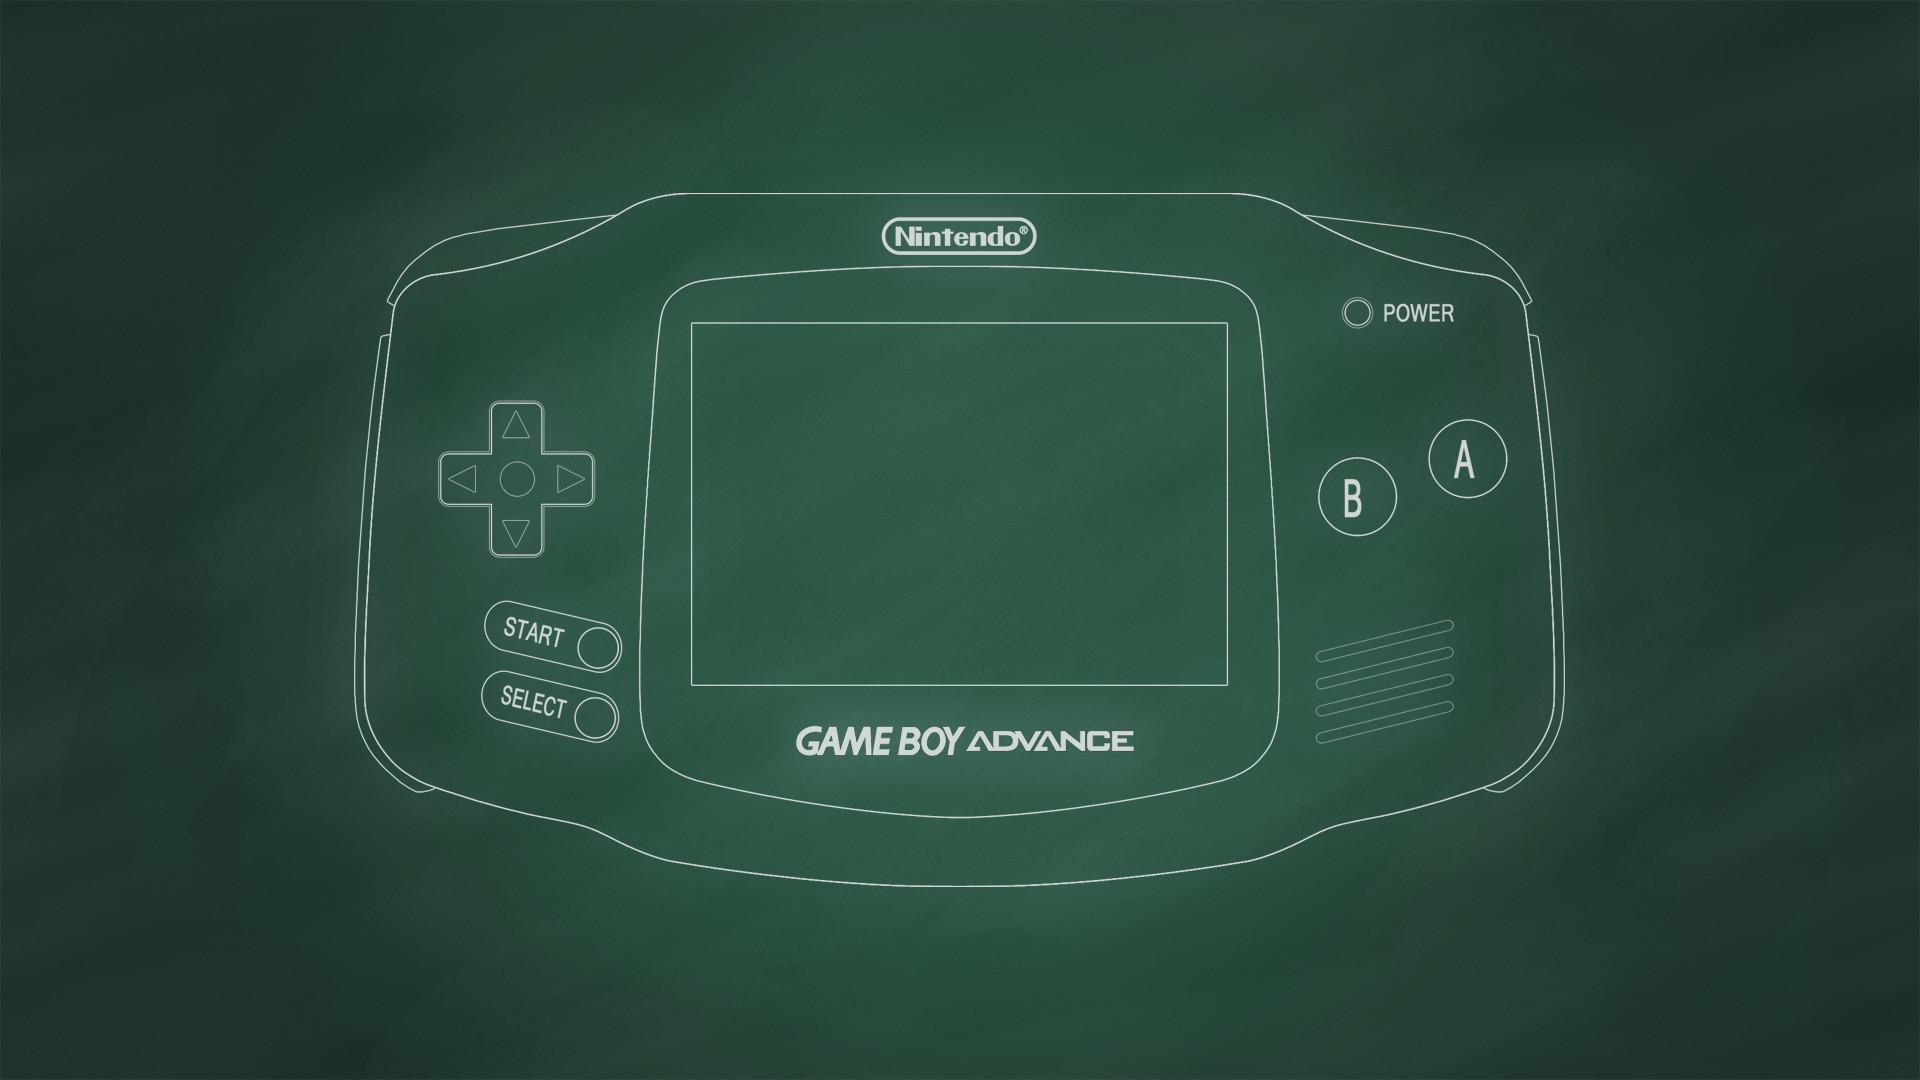 … Game Boy Advance [Chalkboard] by BLUEamnesiac